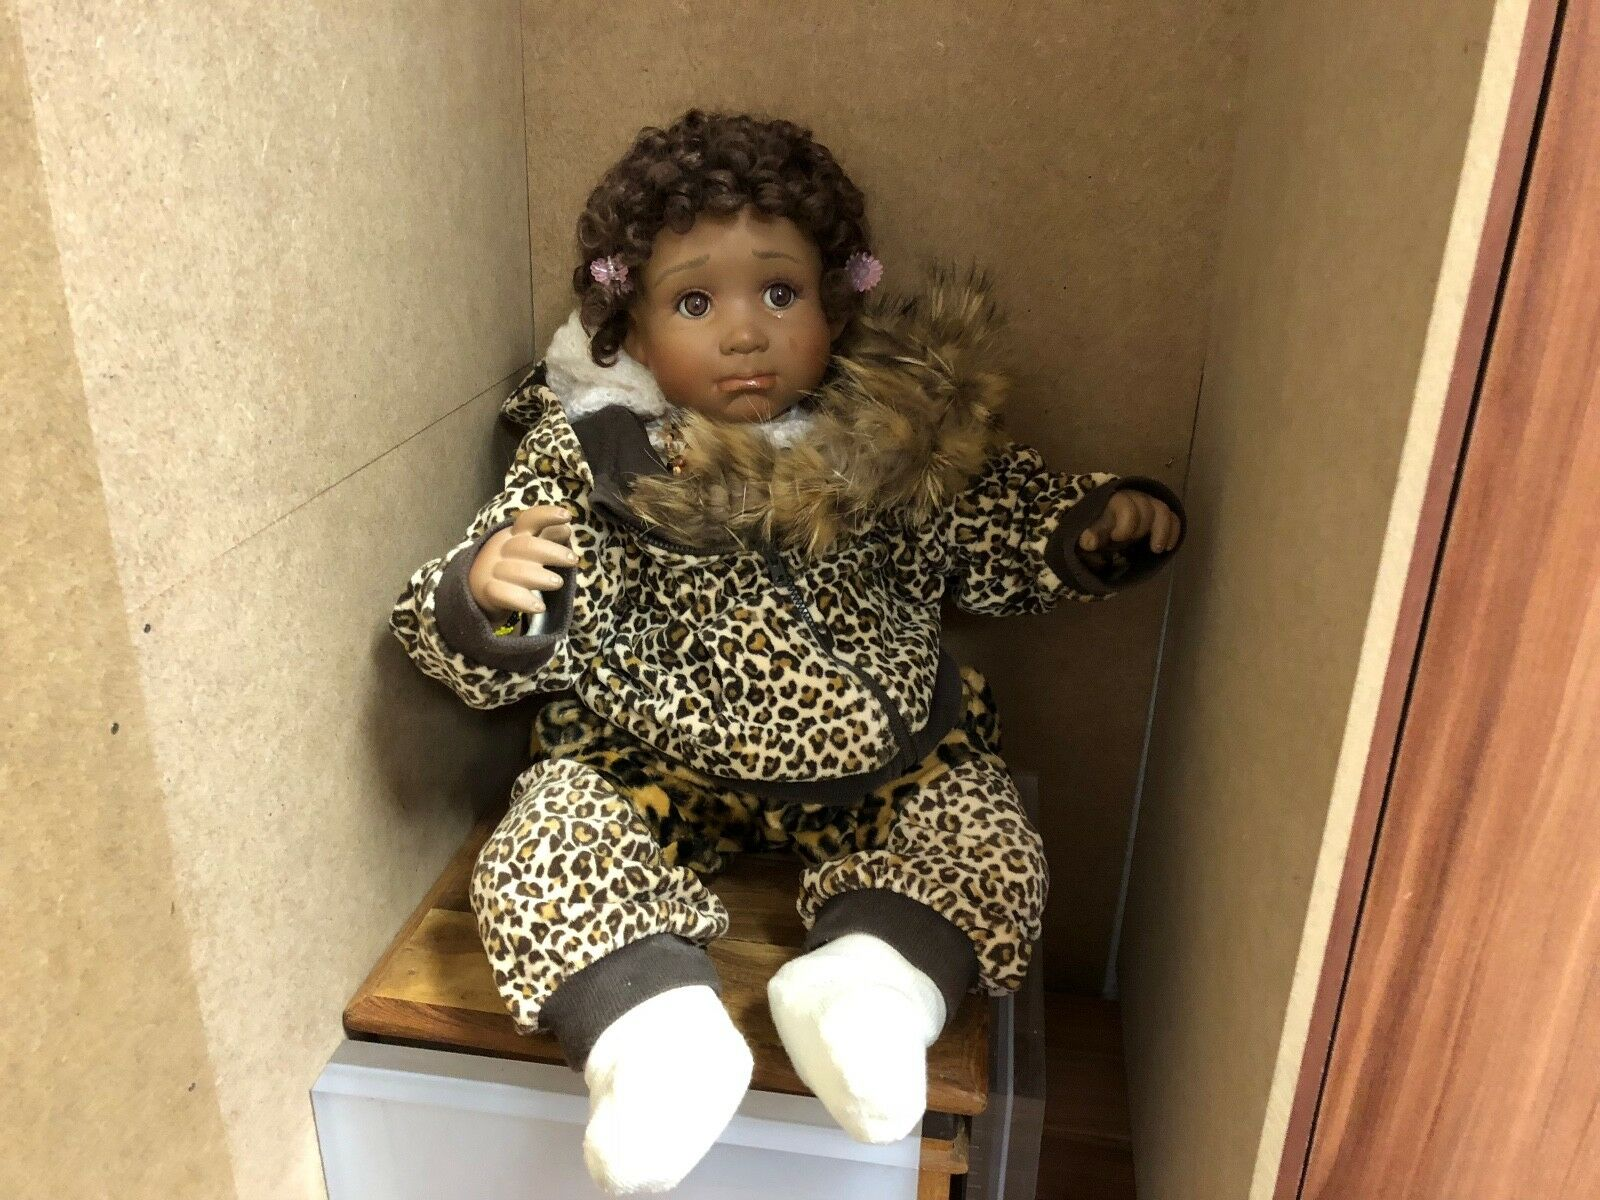 Artistas muñeca muñeca de porcelana 57 cm. top estado.